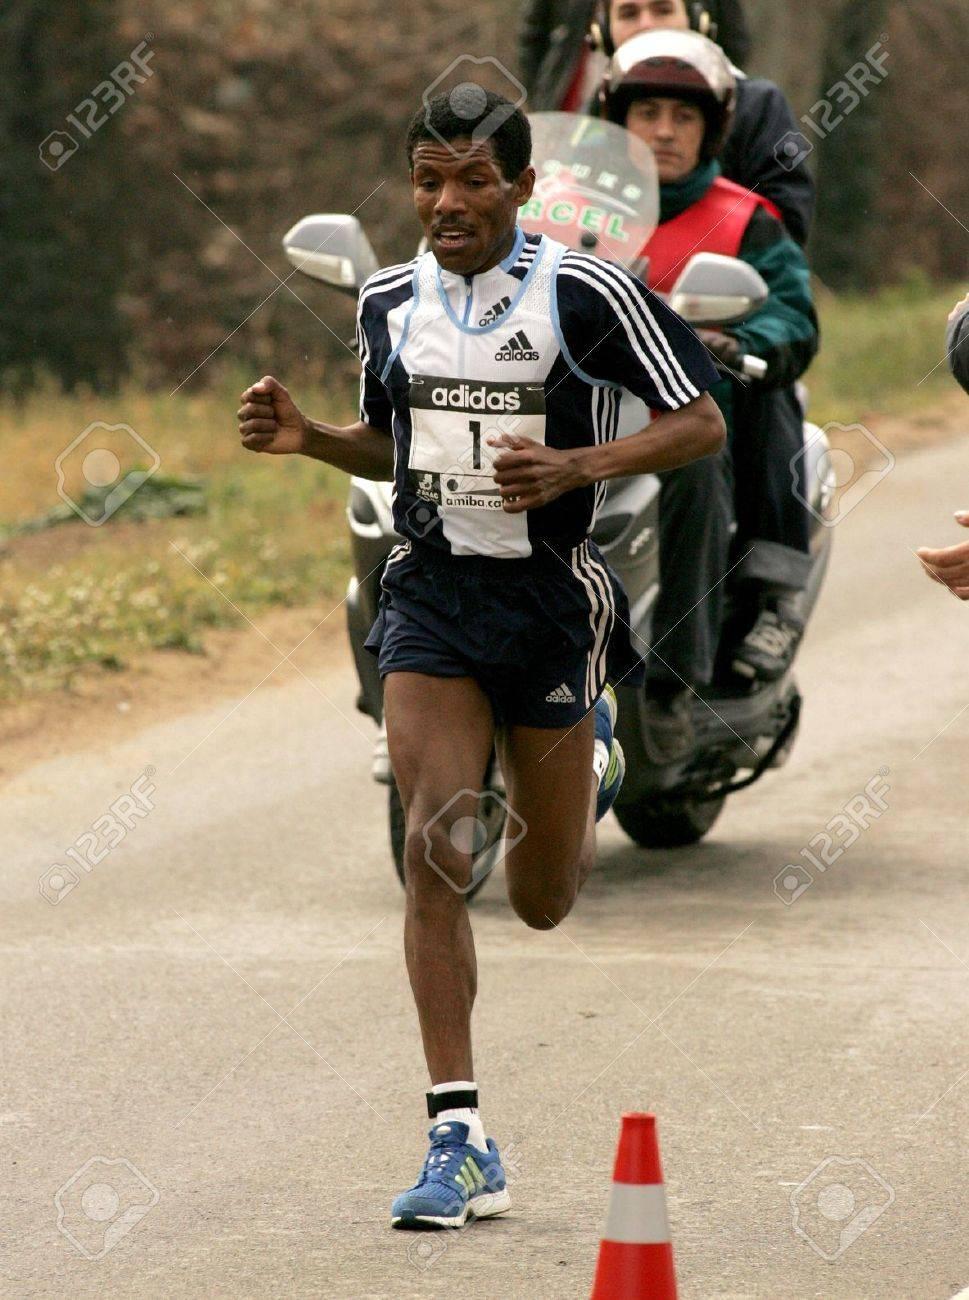 2e2458d170fd Stock Photo - The World Recordman Marathon Haile Gebrselassie running  during Granollers Half Marathon at Granollers on February 6